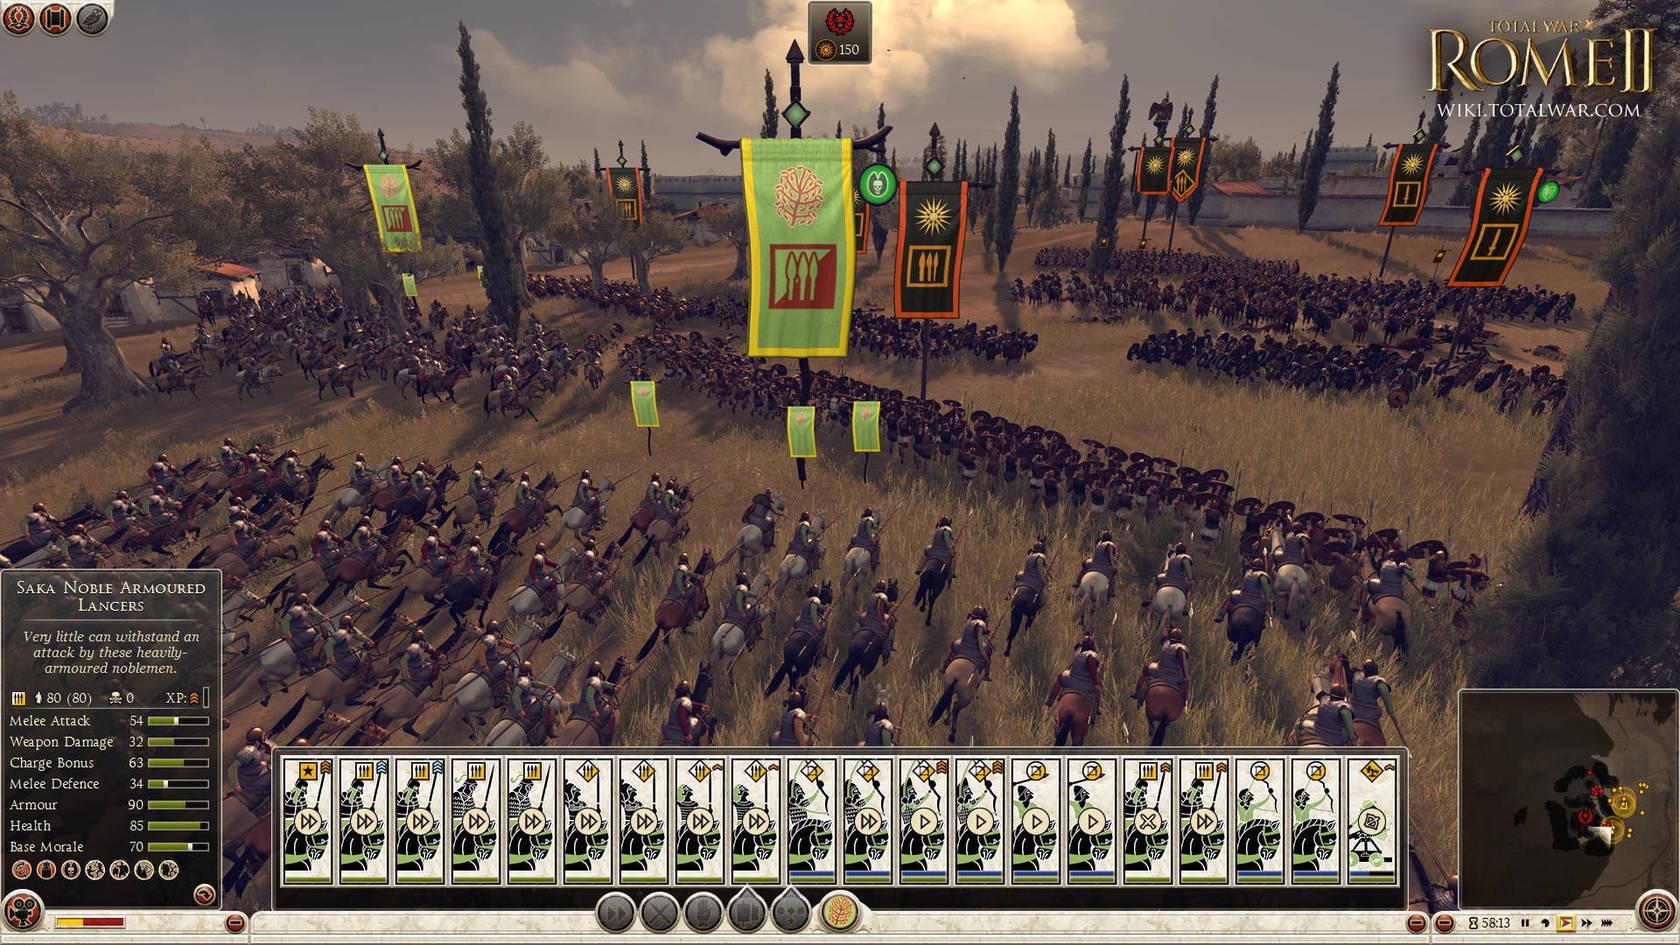 Total war: rome ii - beasts of war unit pack download 1.7.10